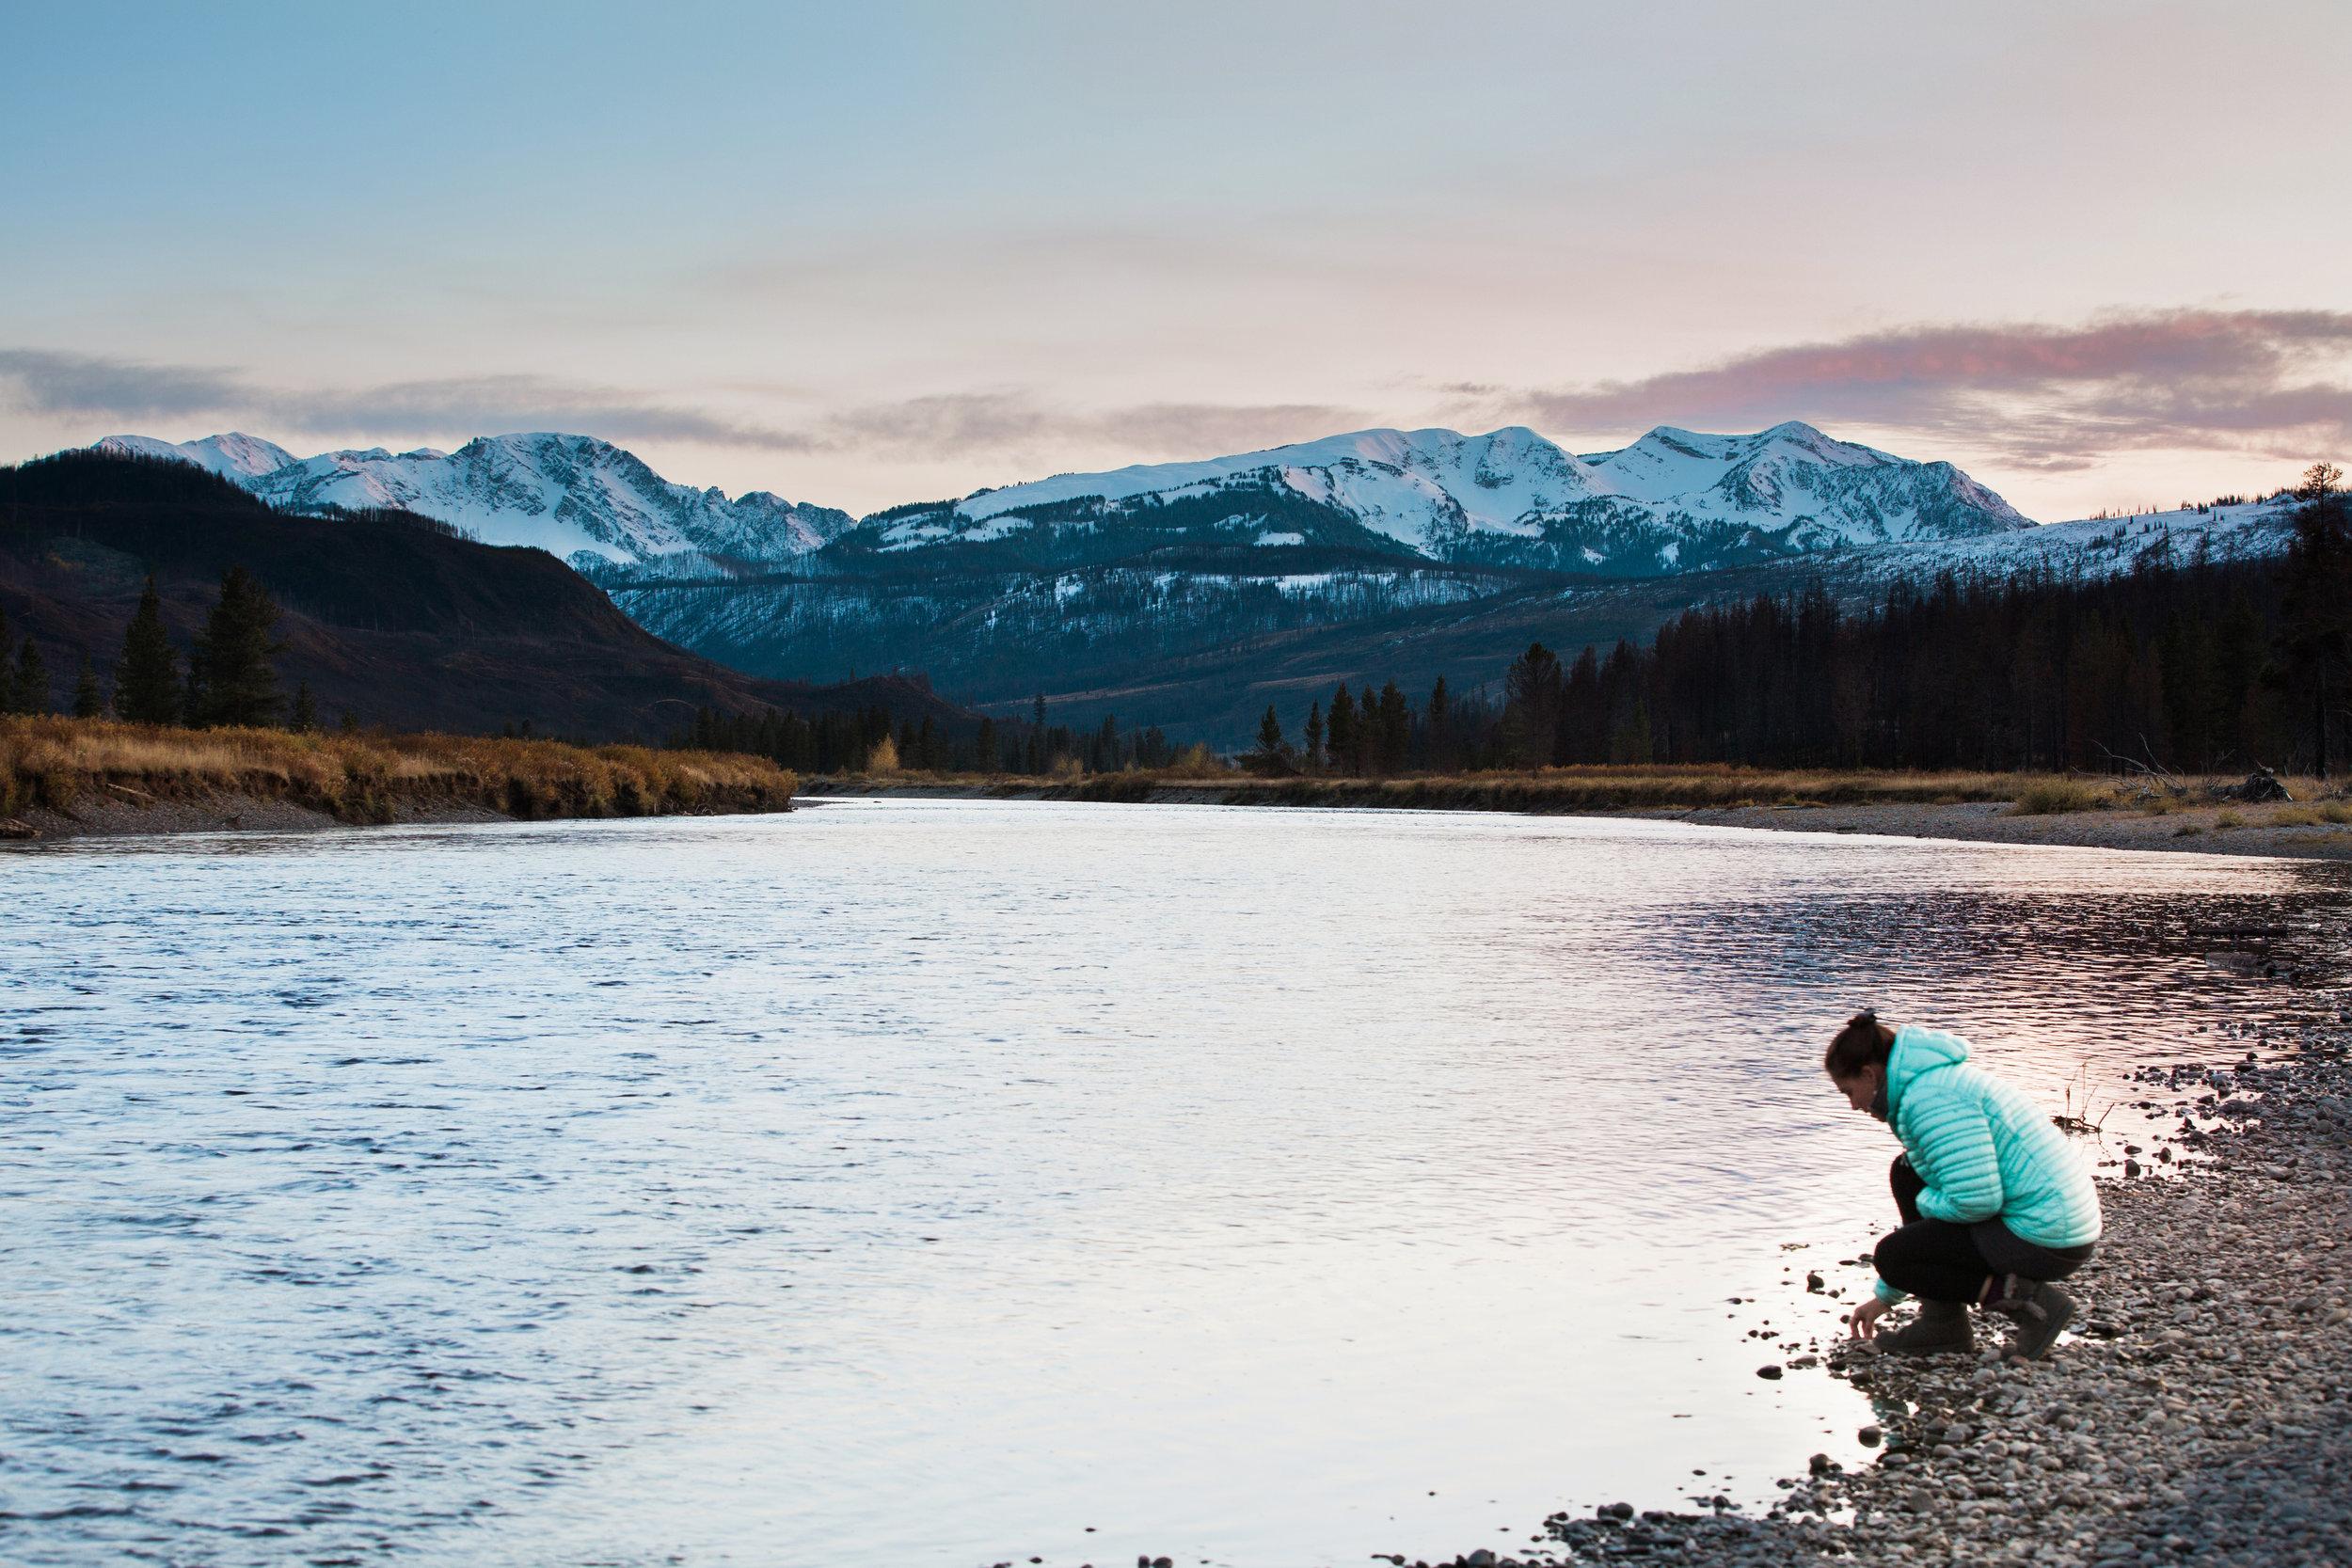 CindyGiovagnoli_outdoor_adventure_photography_Grand_Teton_Yellowstone_Glacier_National_Park_Montana_Wyoming_South_Dakota_Mount_Rushmore_Badlands-015.jpg